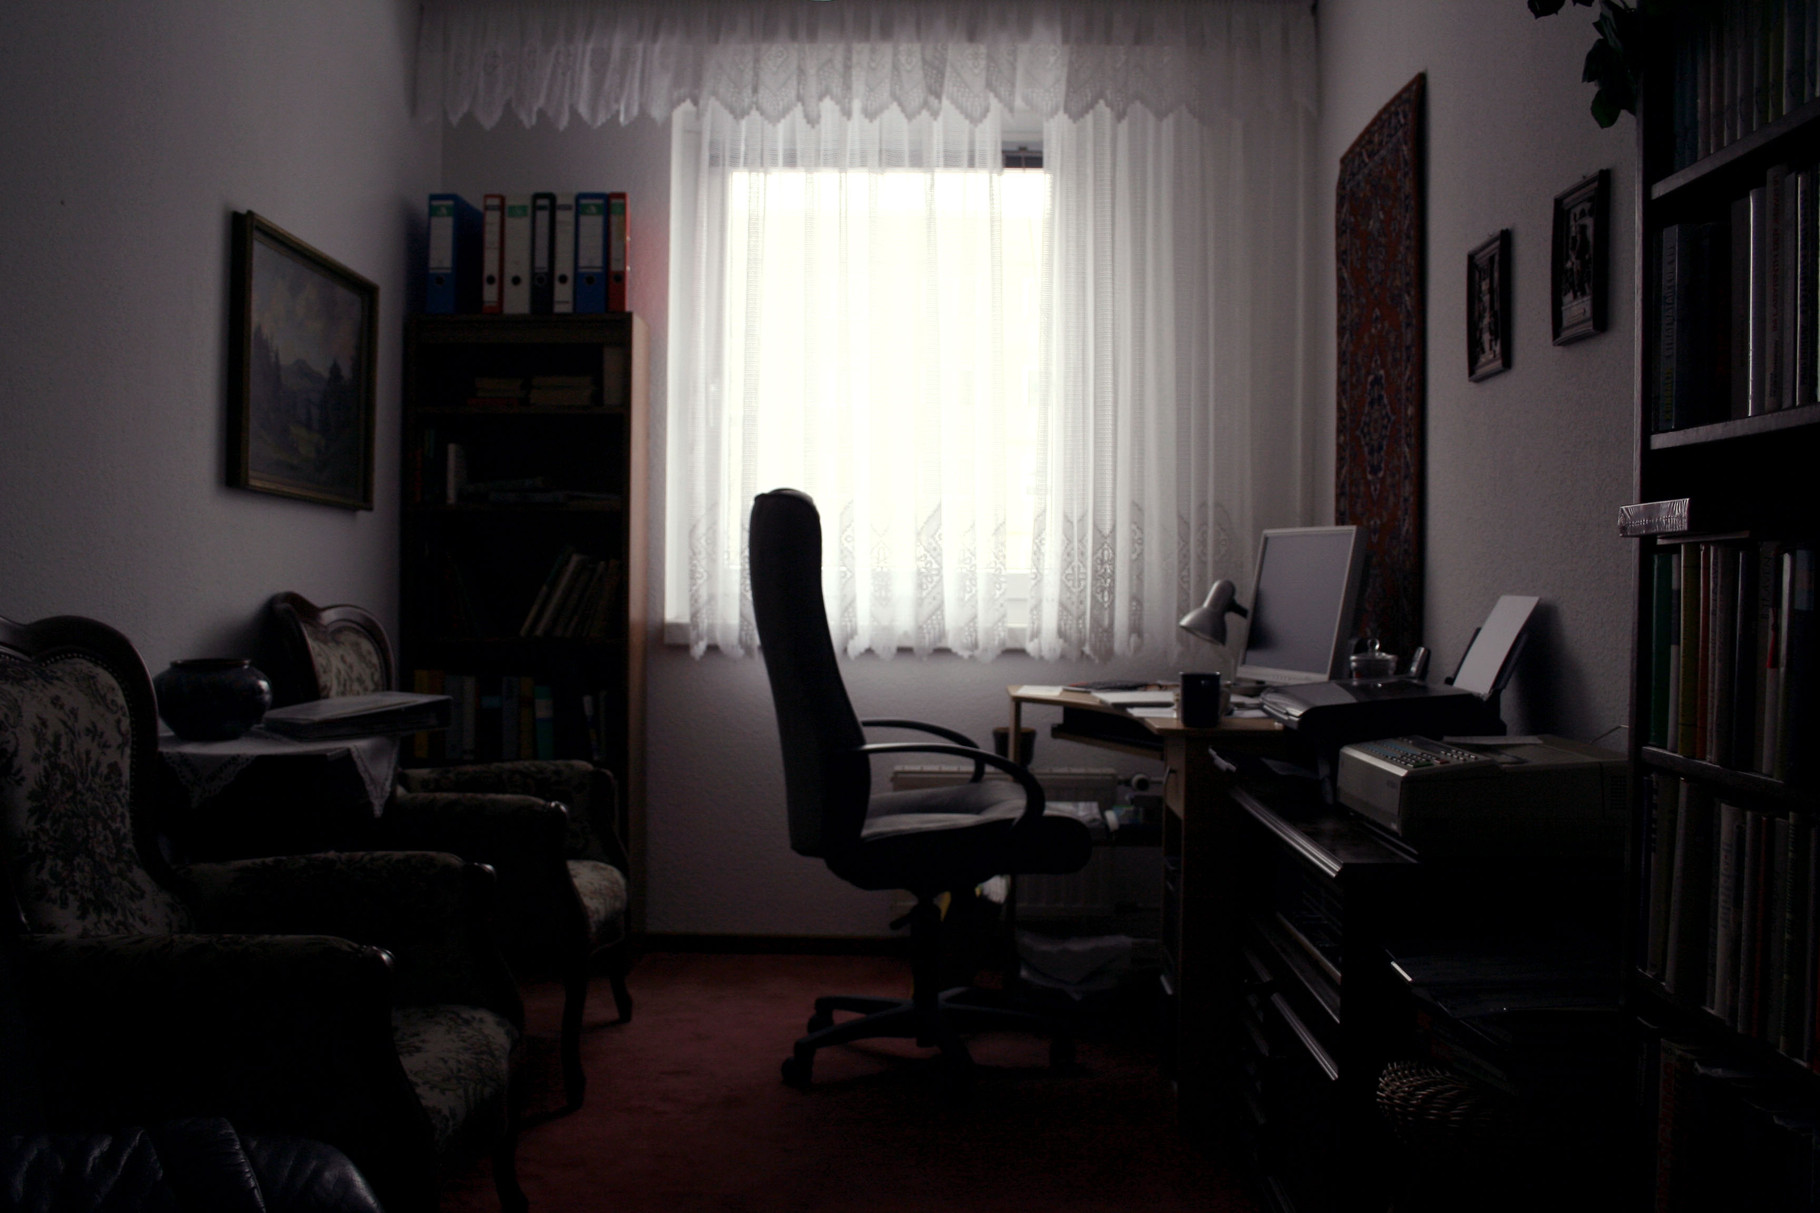 Bestand 5, Bürozimmer